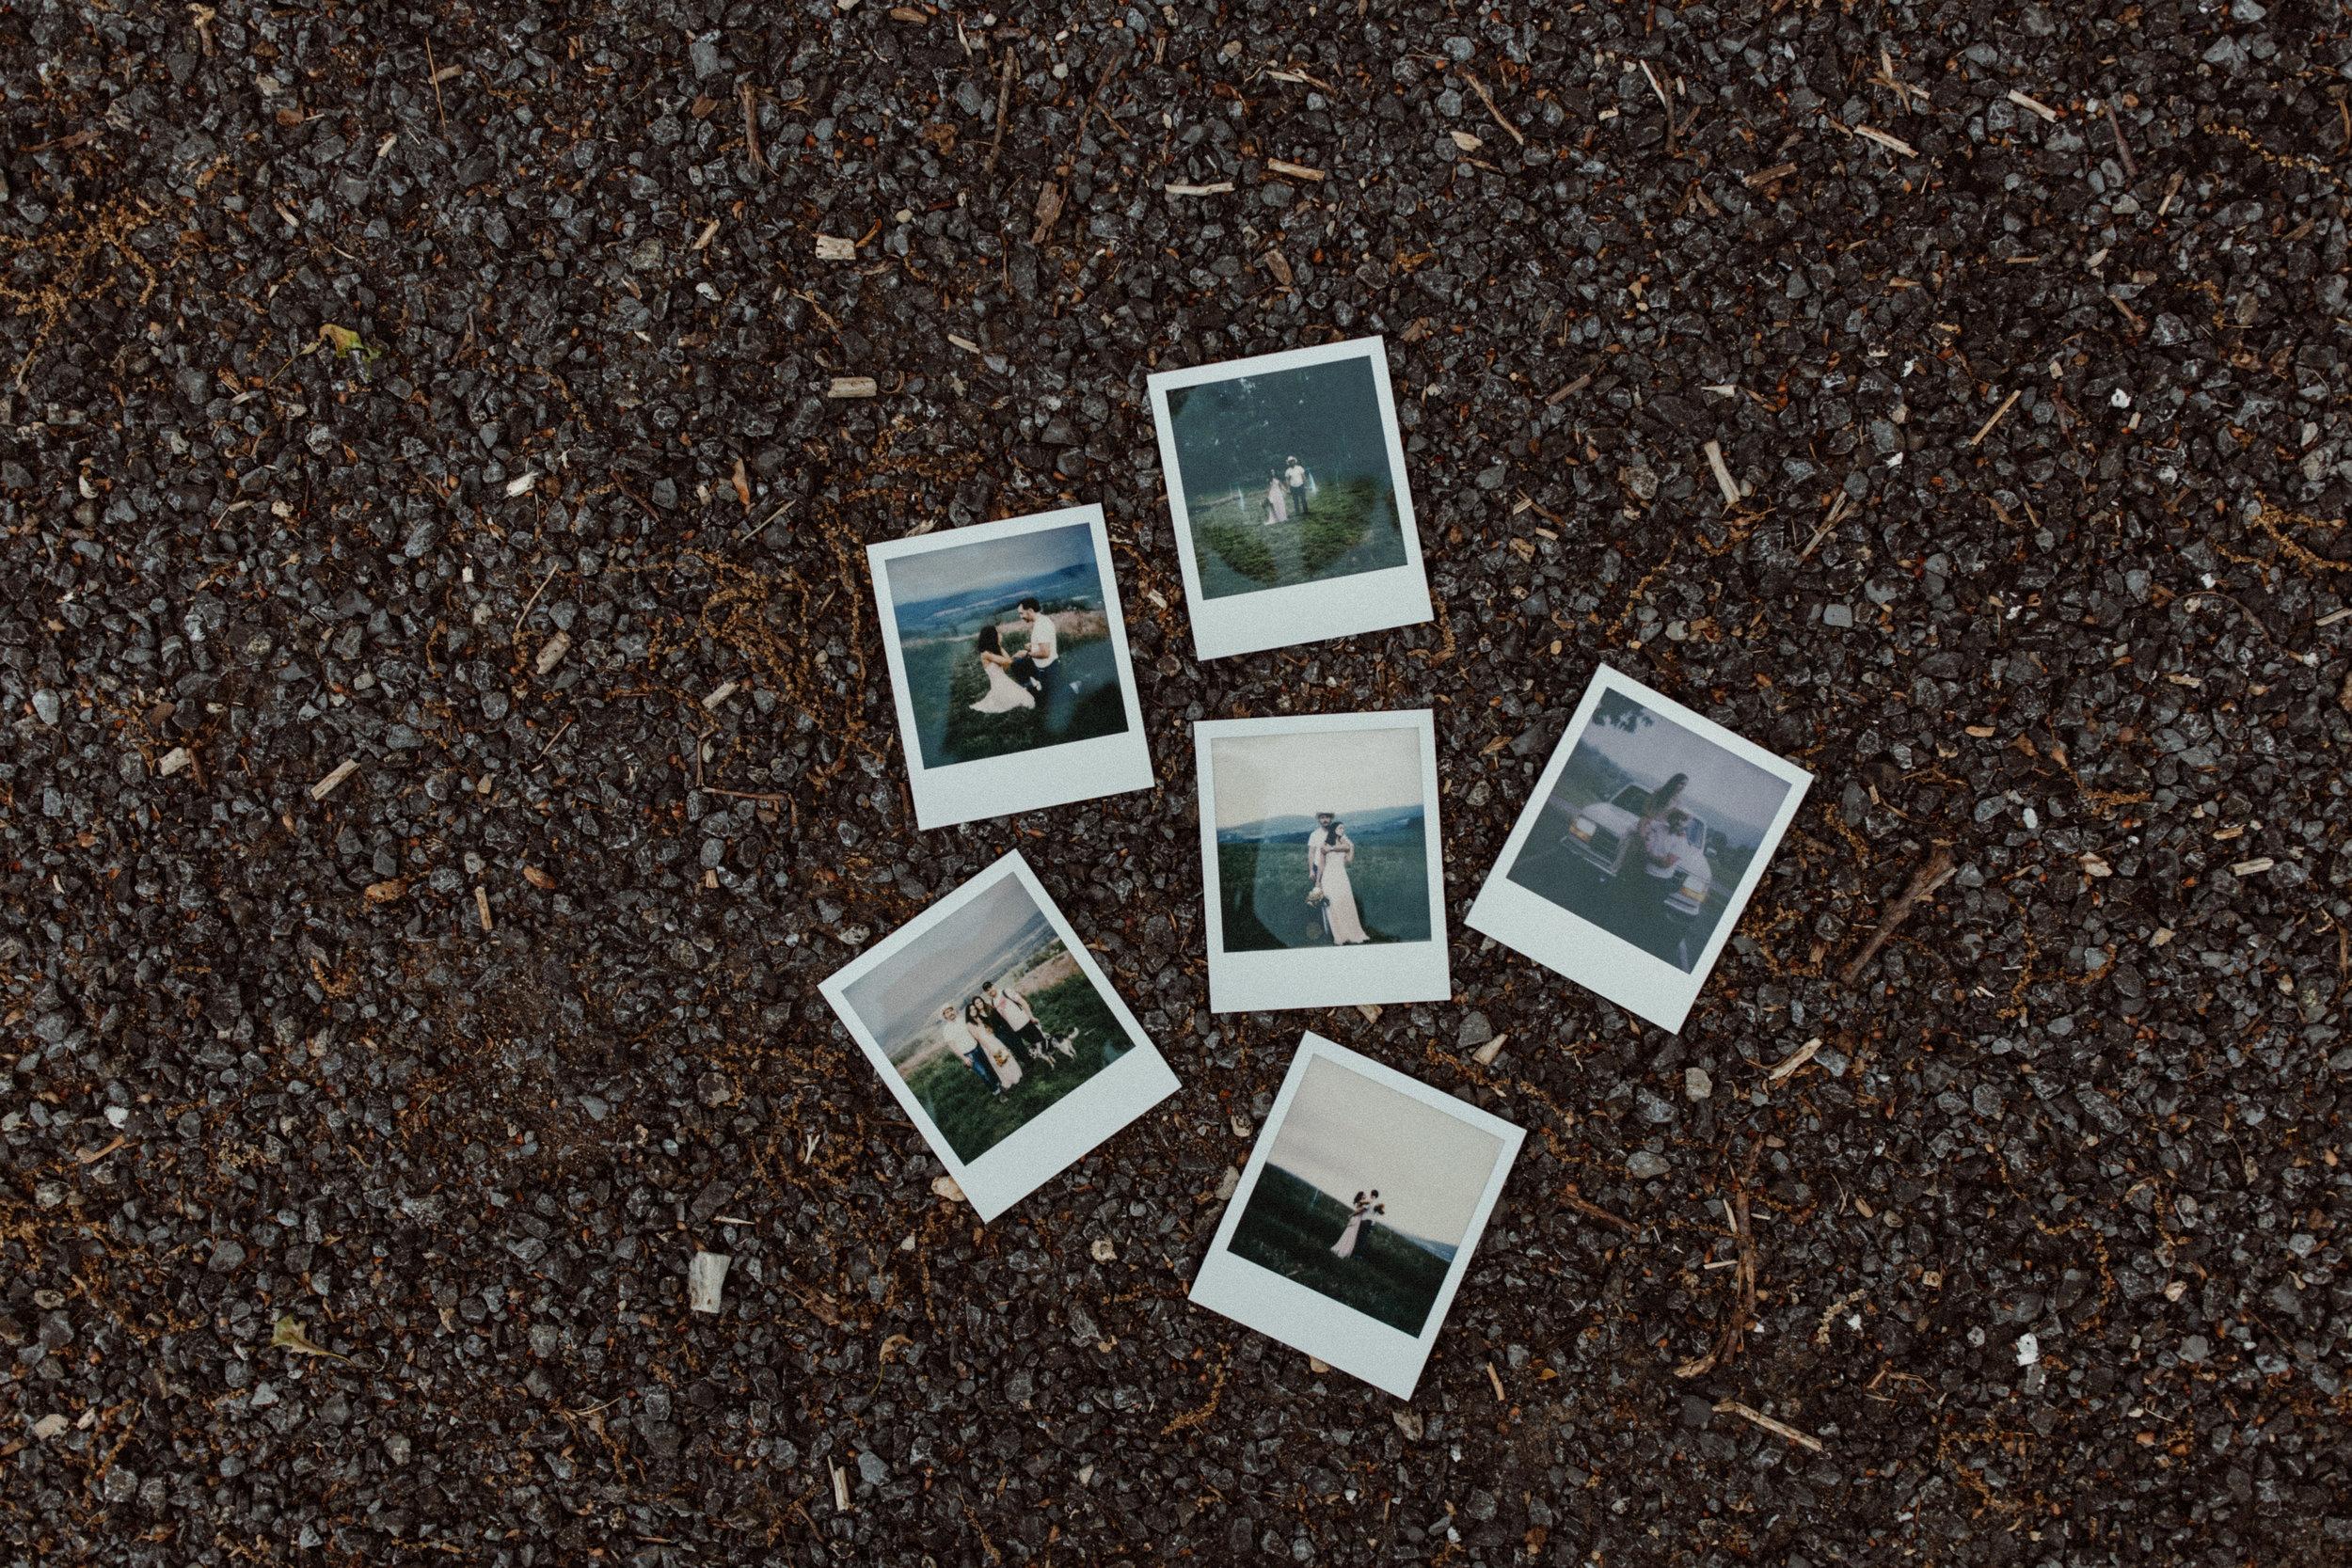 kelsey&mark-engagement-skymeadows-2019-peytoncurry-0281.jpg